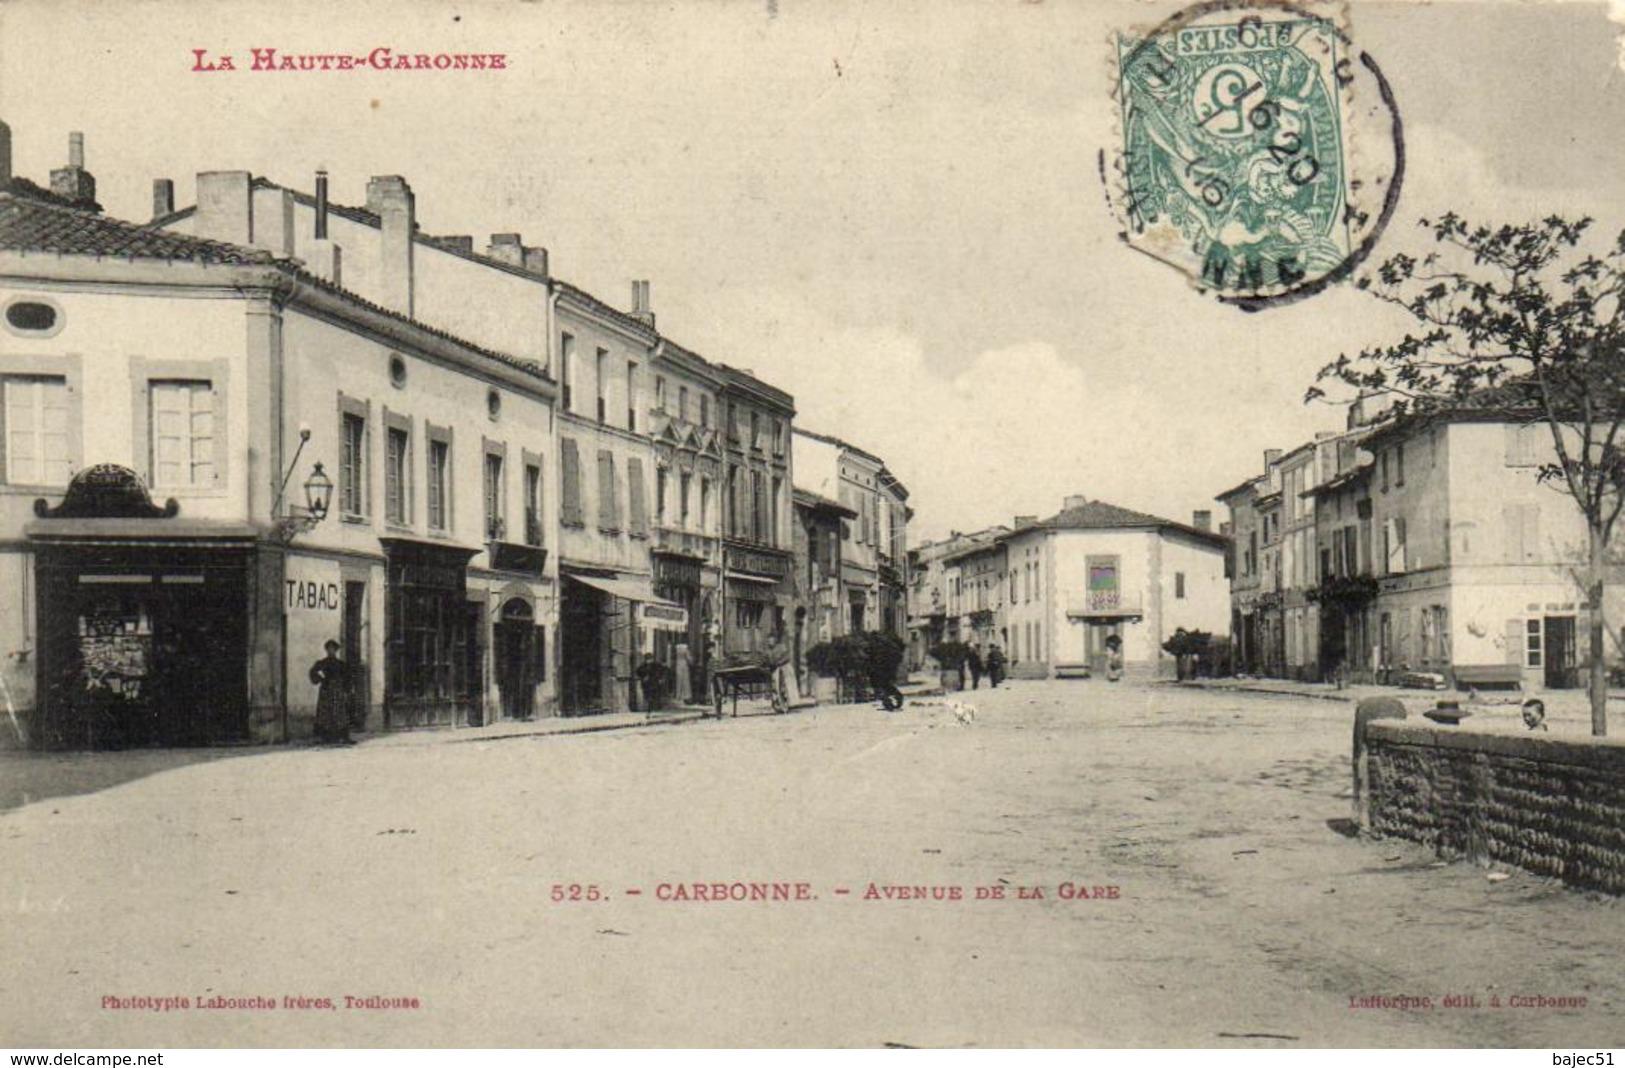 Carbonne - France